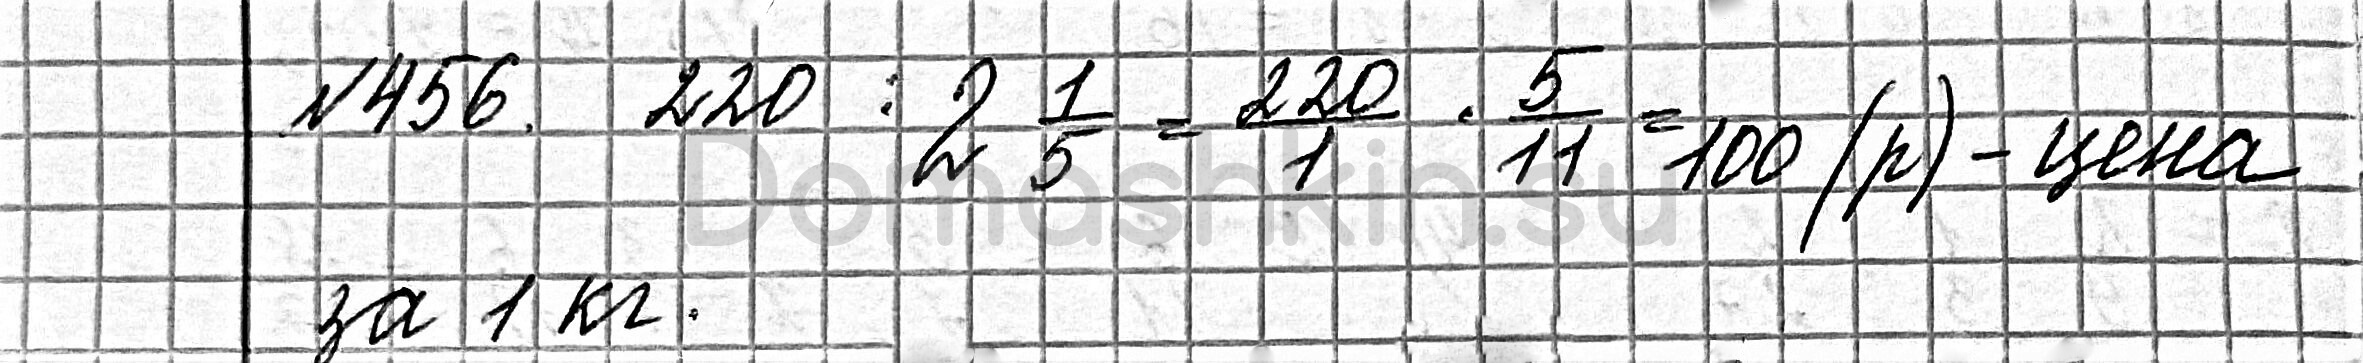 Математика 6 класс учебник Мерзляк номер 456 решение